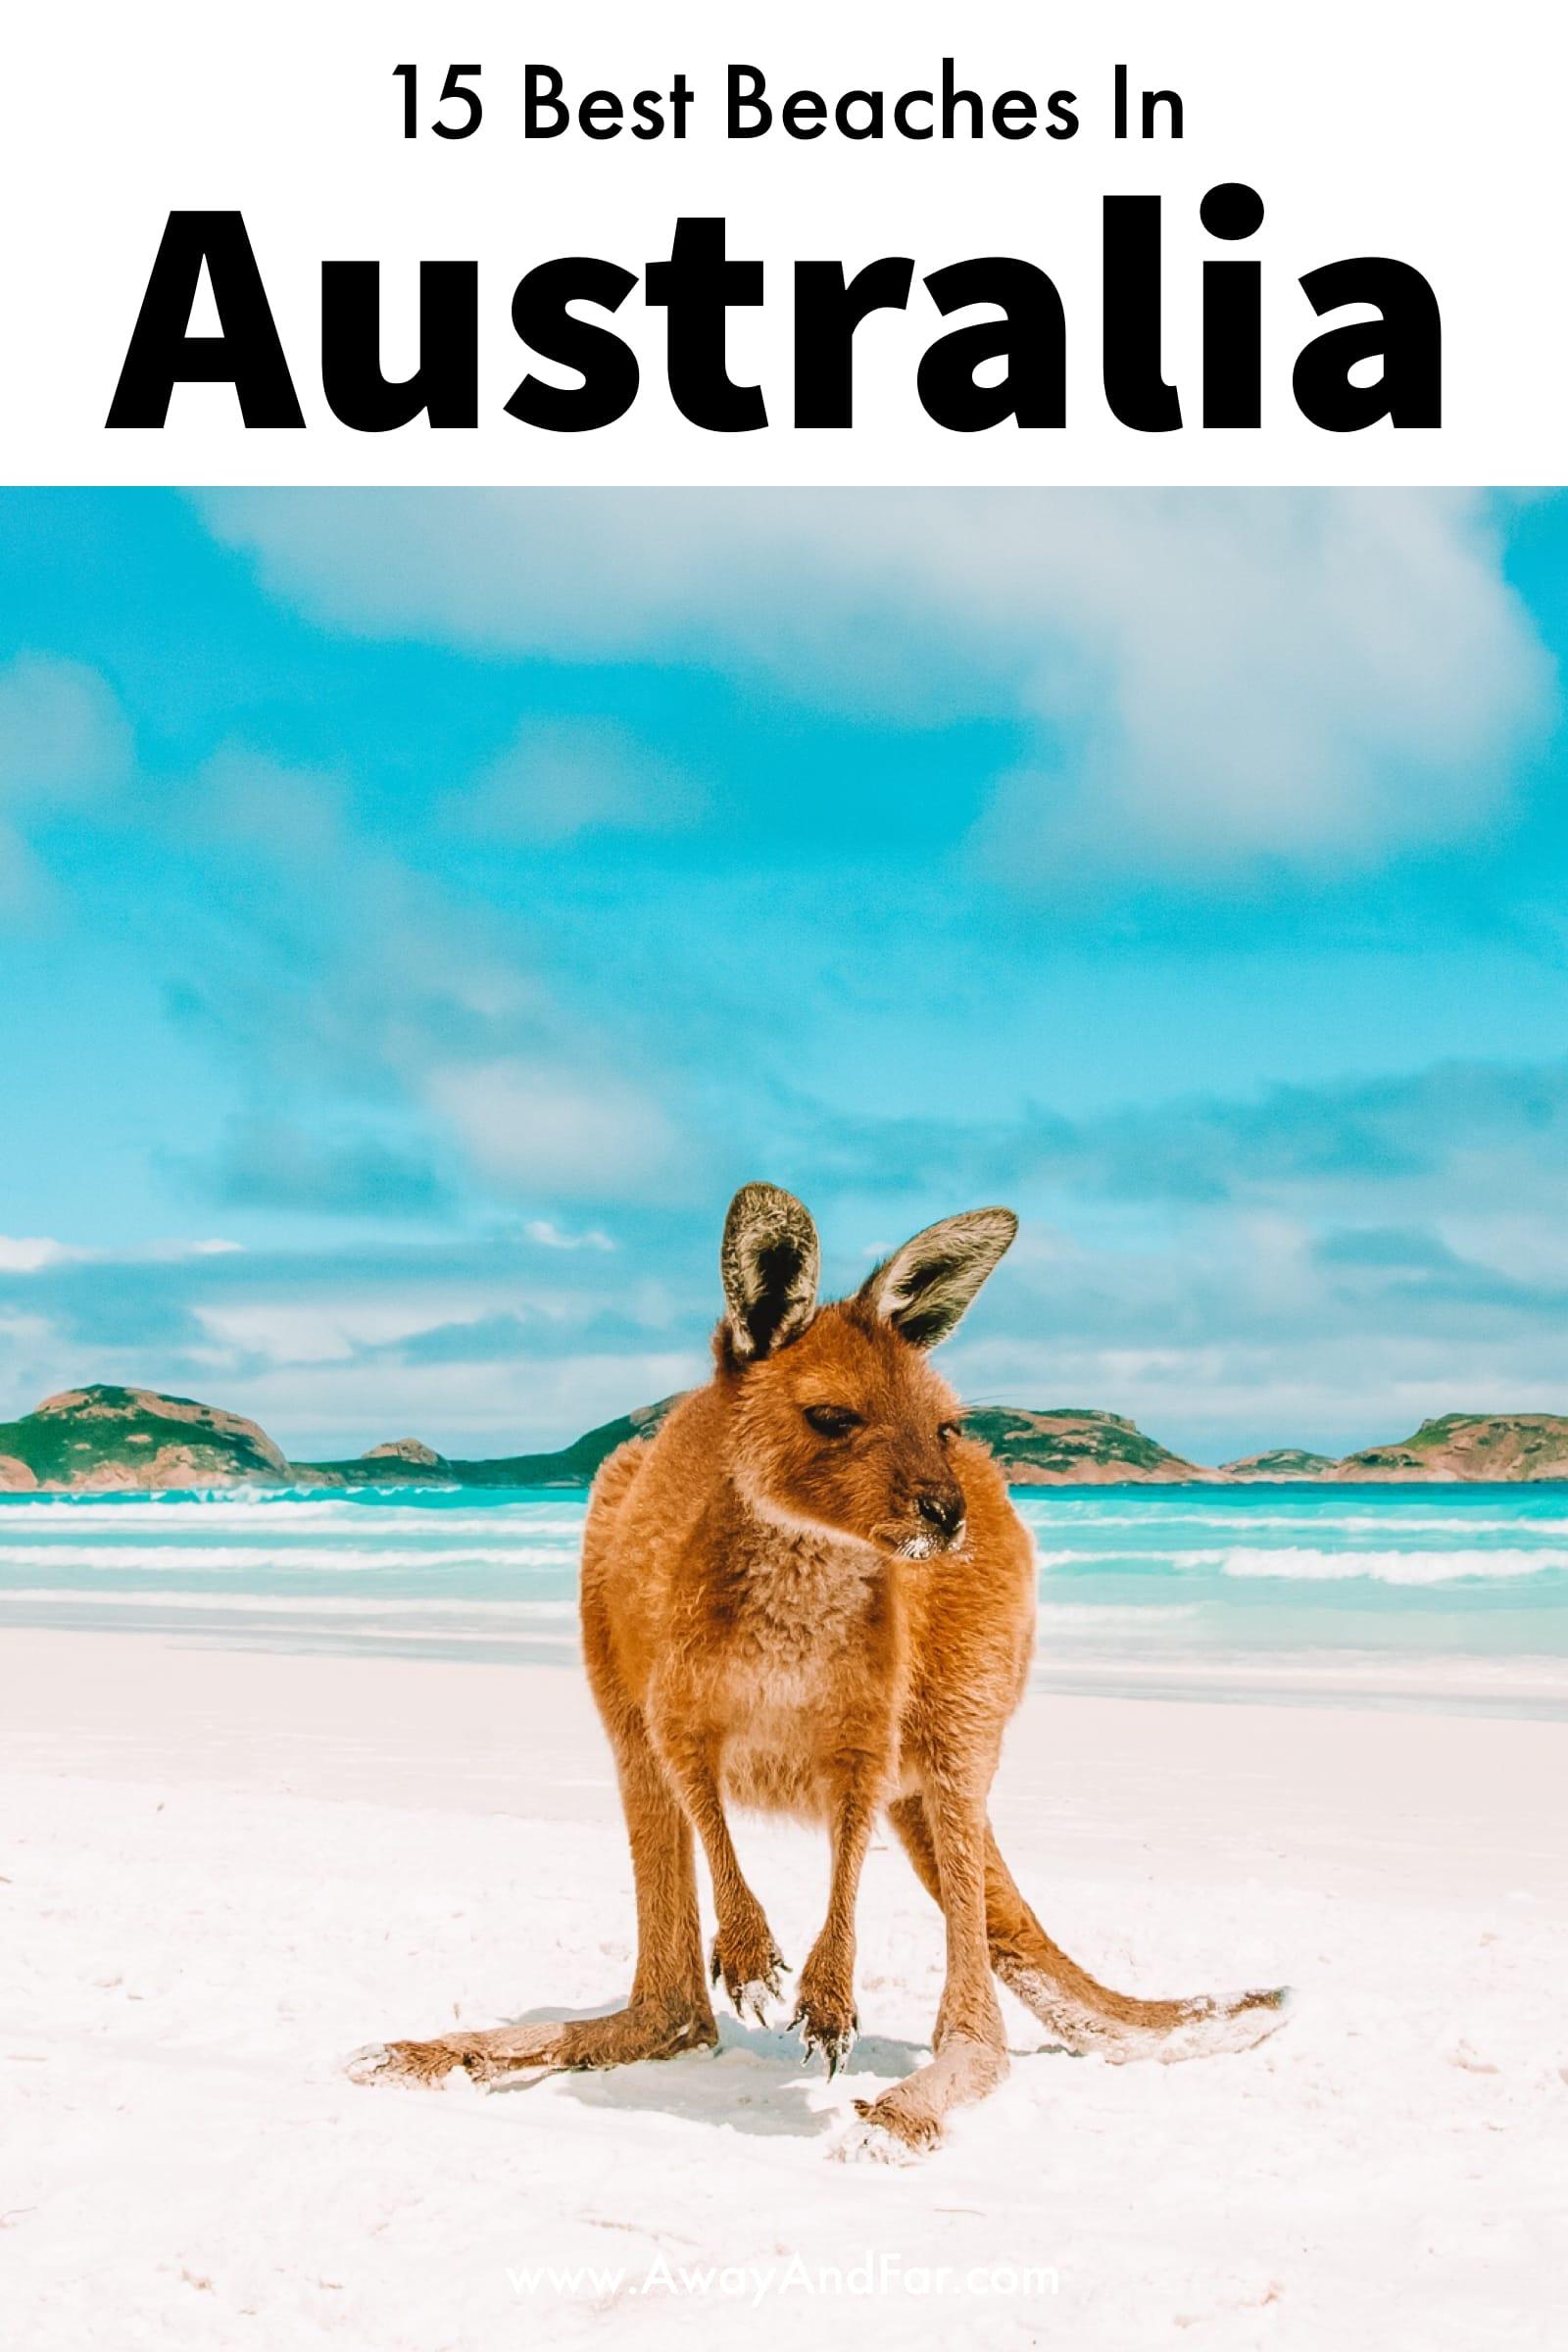 15 Best Beaches In Australia (1)